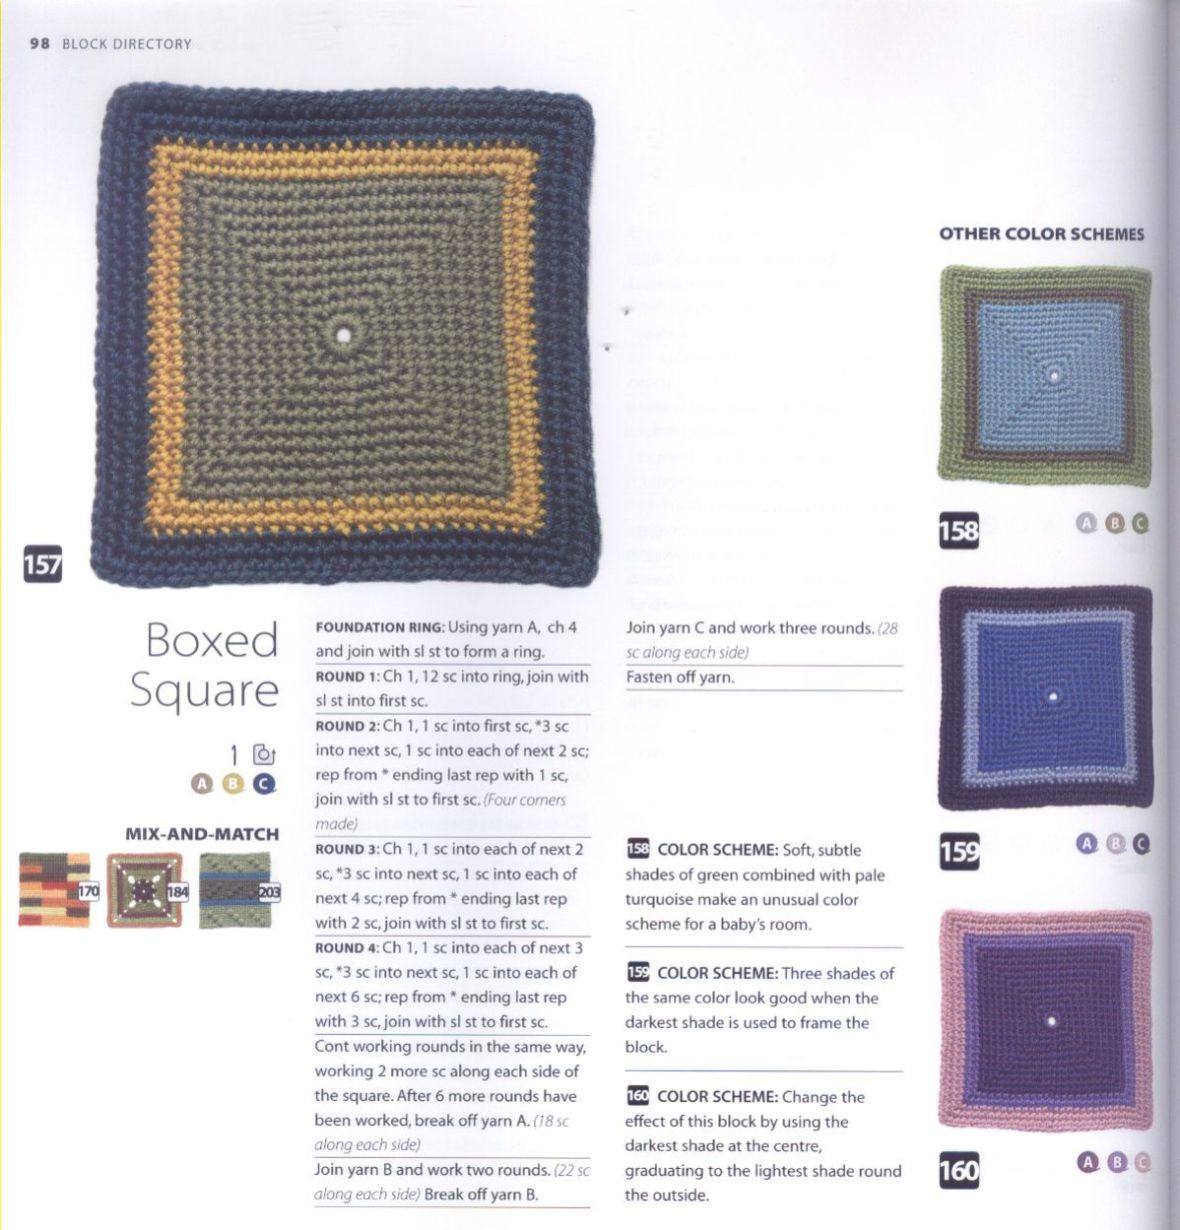 200 Crocheted Blocks for blankets, throws & Afghans 098